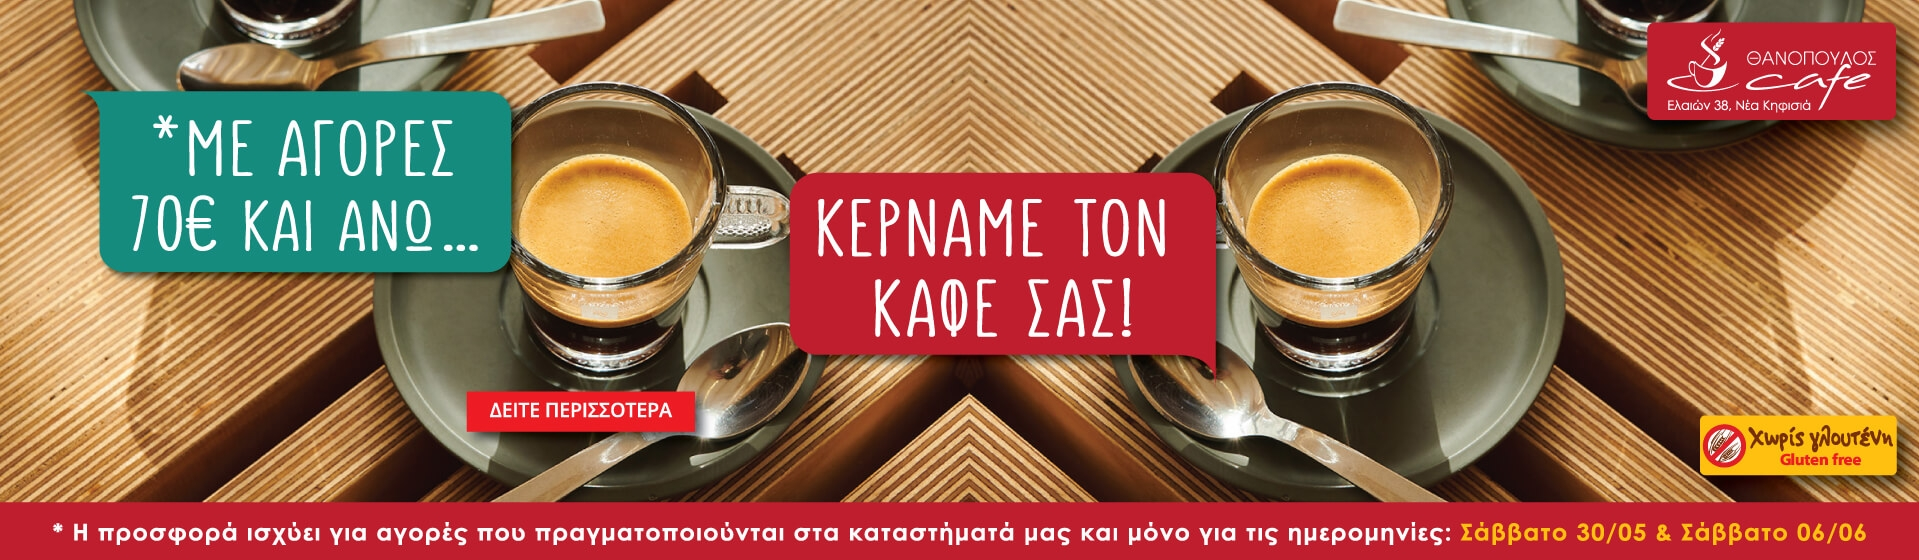 cafe Θανόπουλος